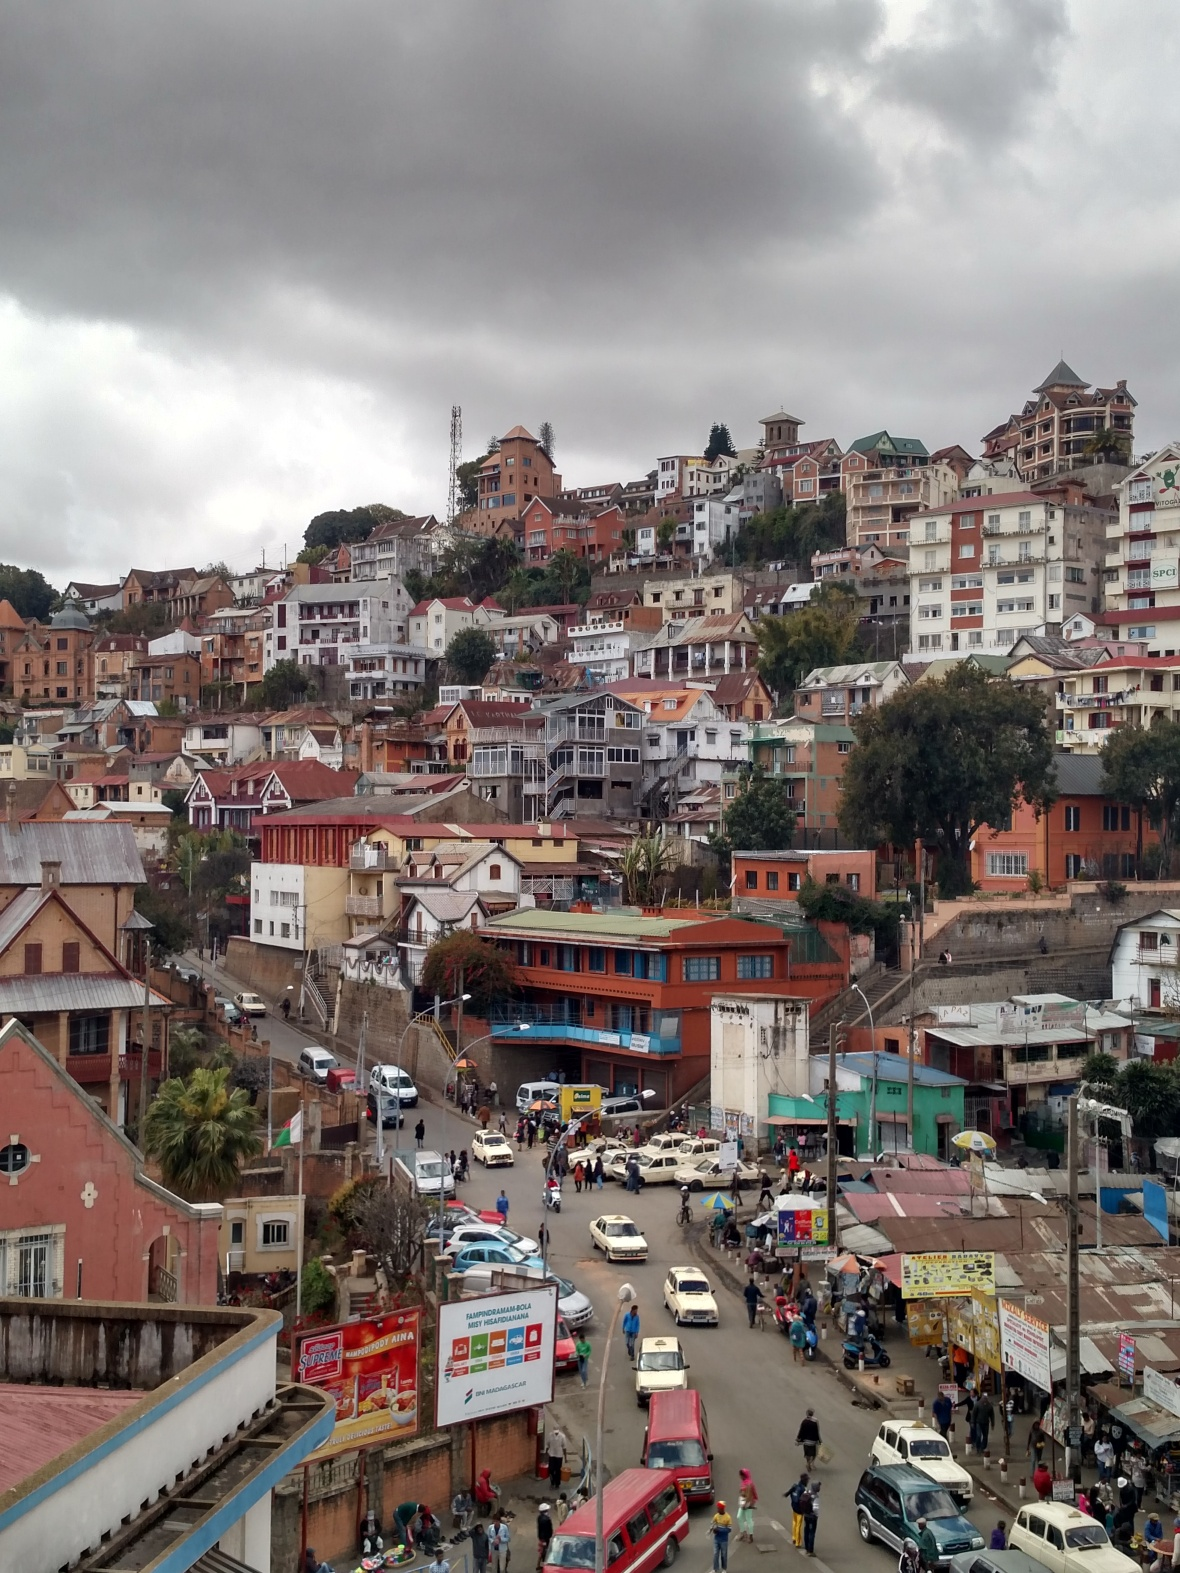 Charming streets of Antananarivo, Madagascar